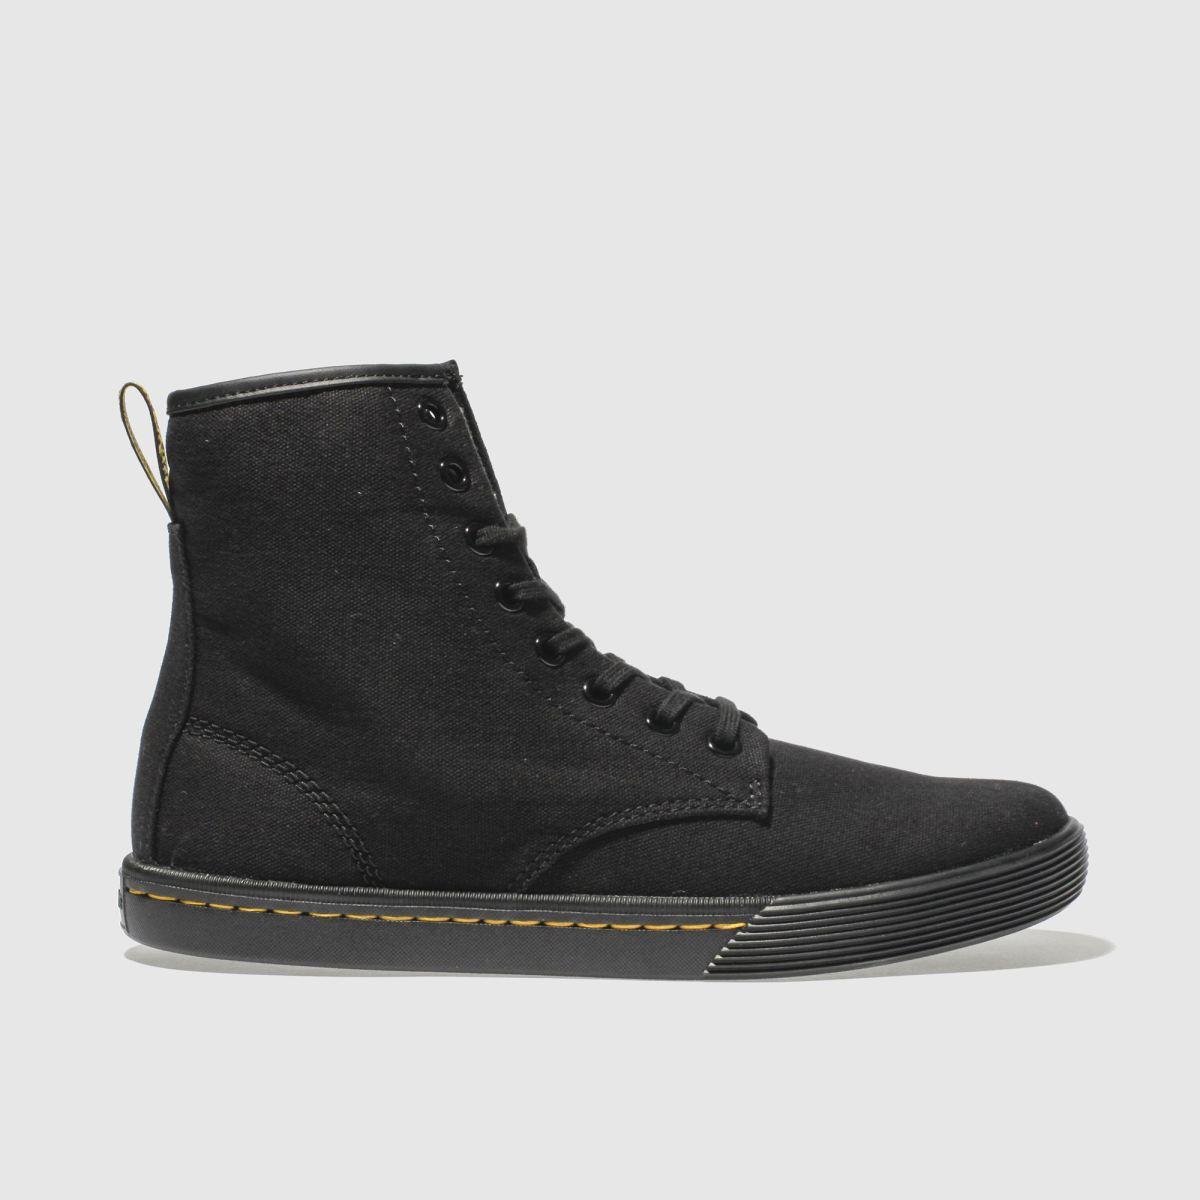 Dr Martens Black Sheridan Boots